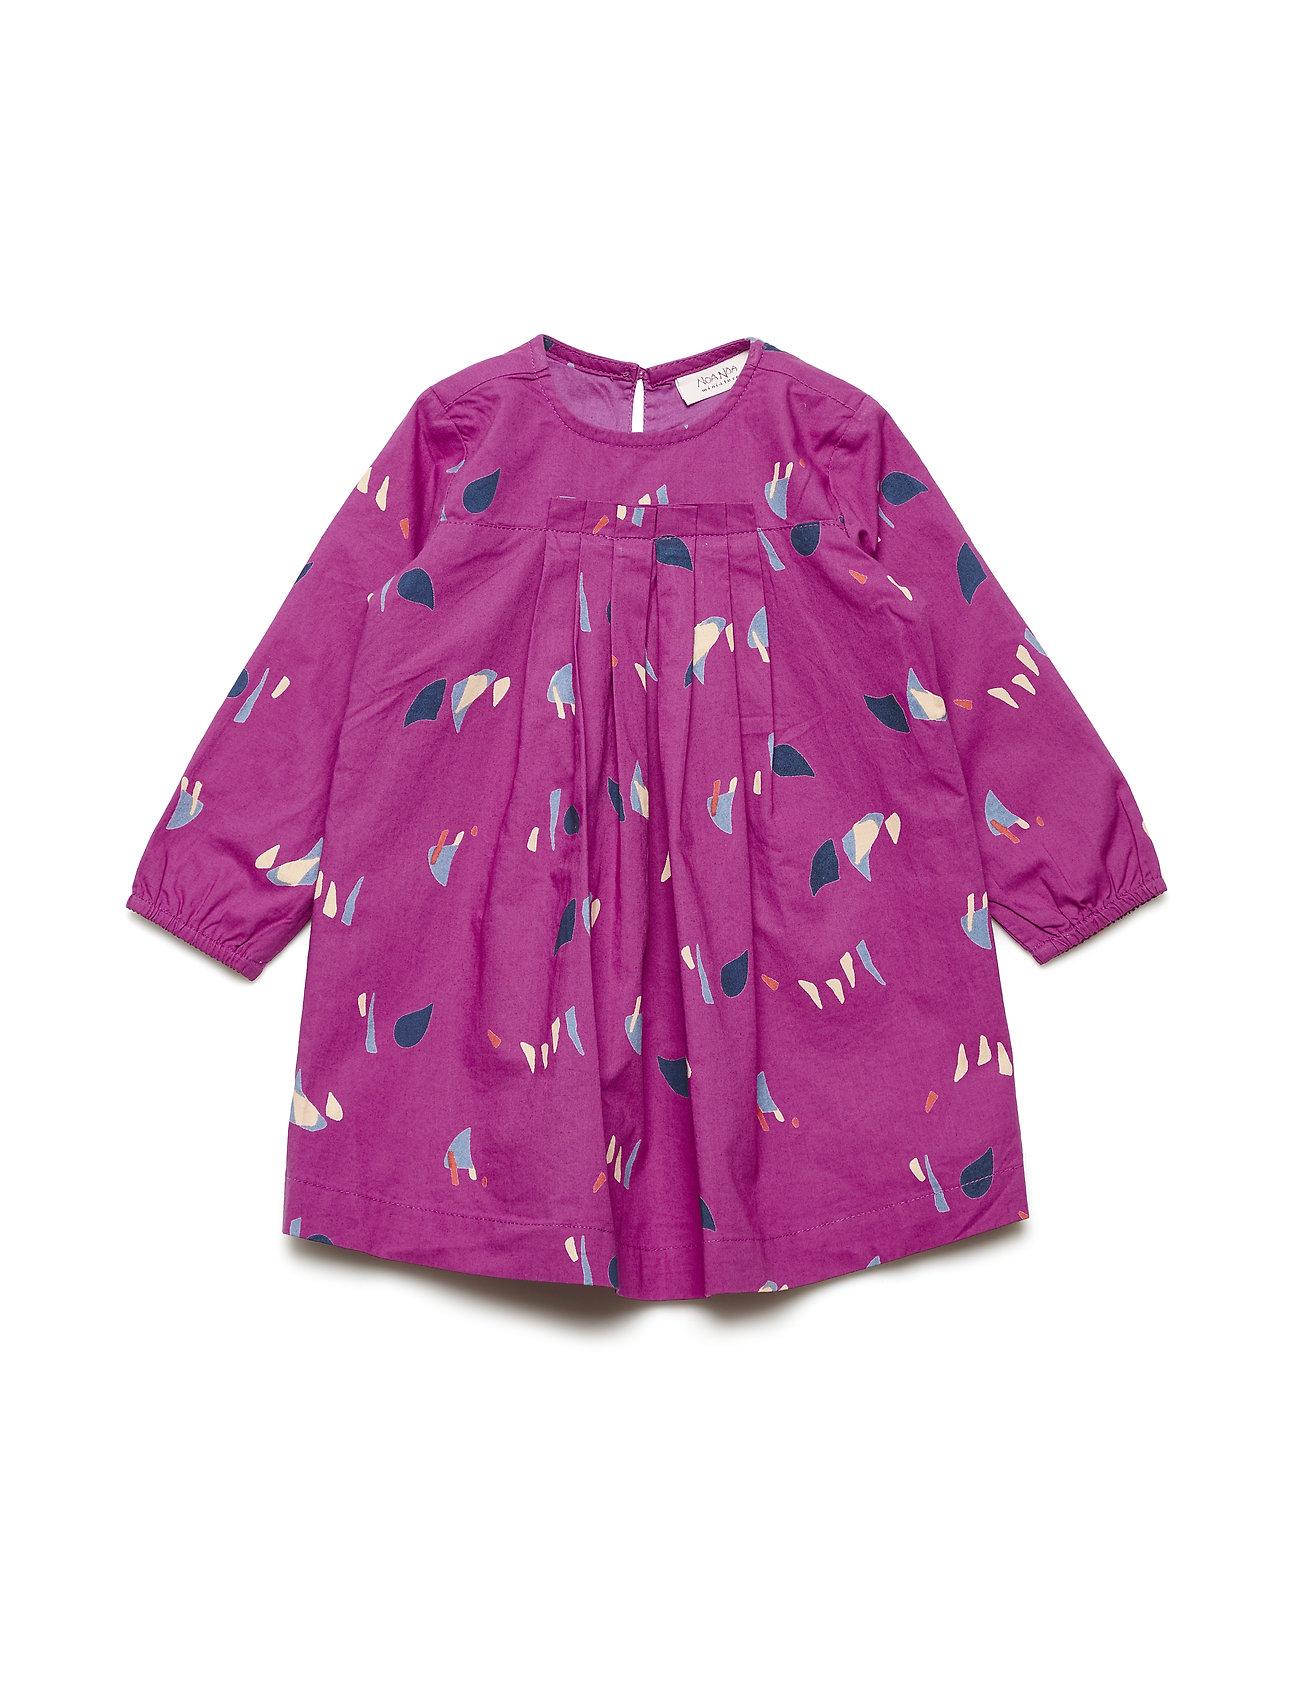 Noa Noa Miniature Dress long sleeve - MAGENTA HAZE